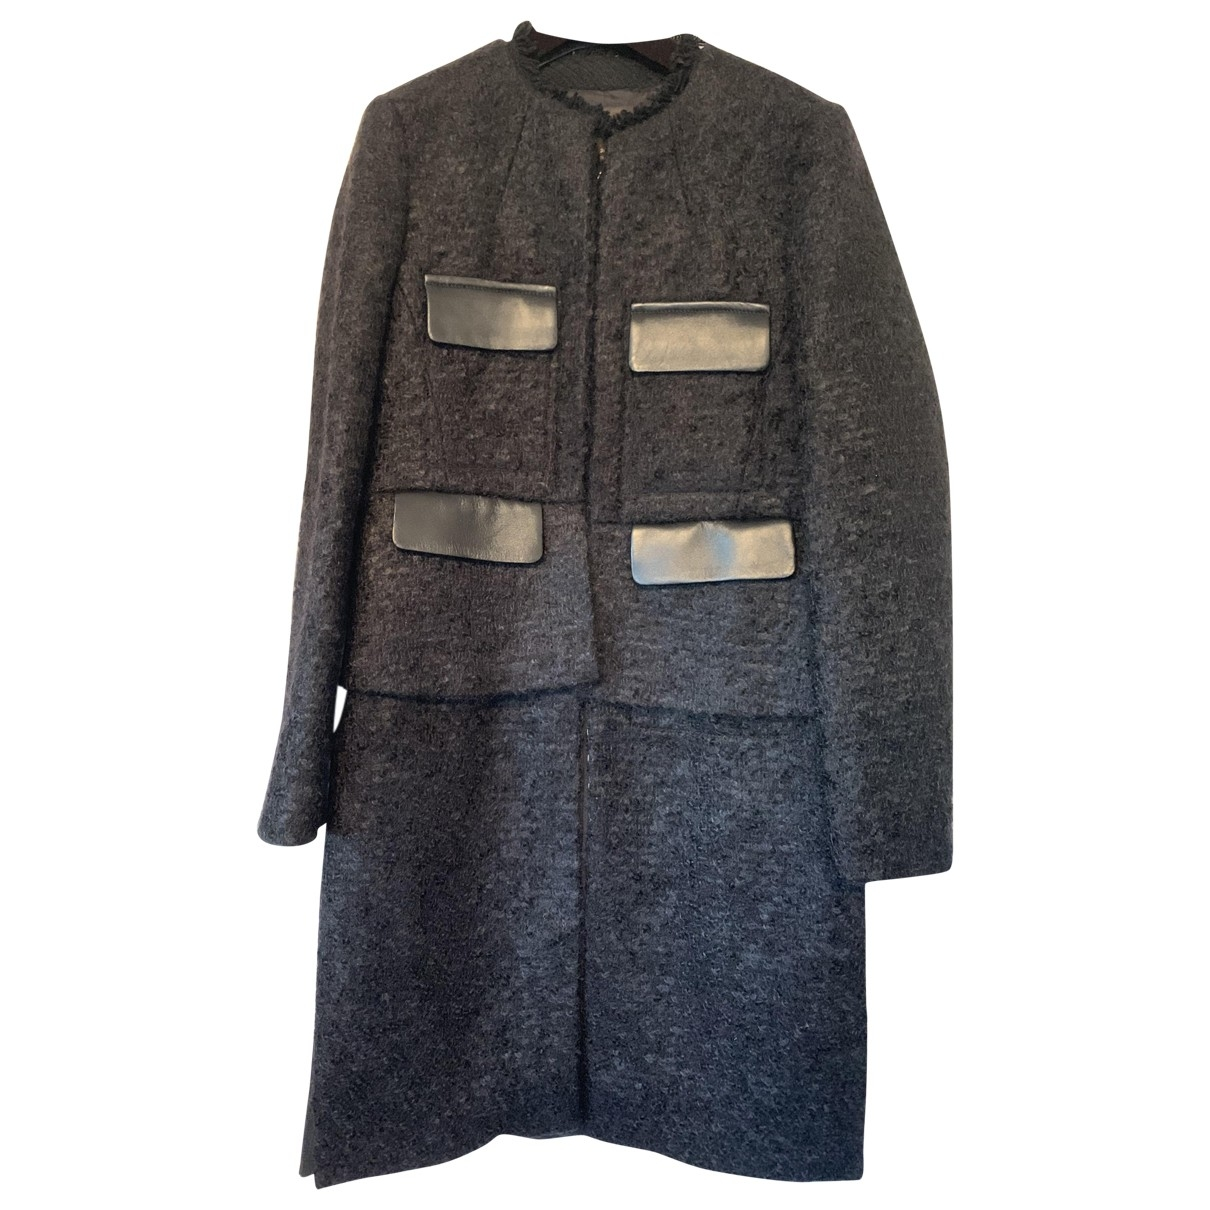 Louis Vuitton \N Grey coat for Women 38 FR